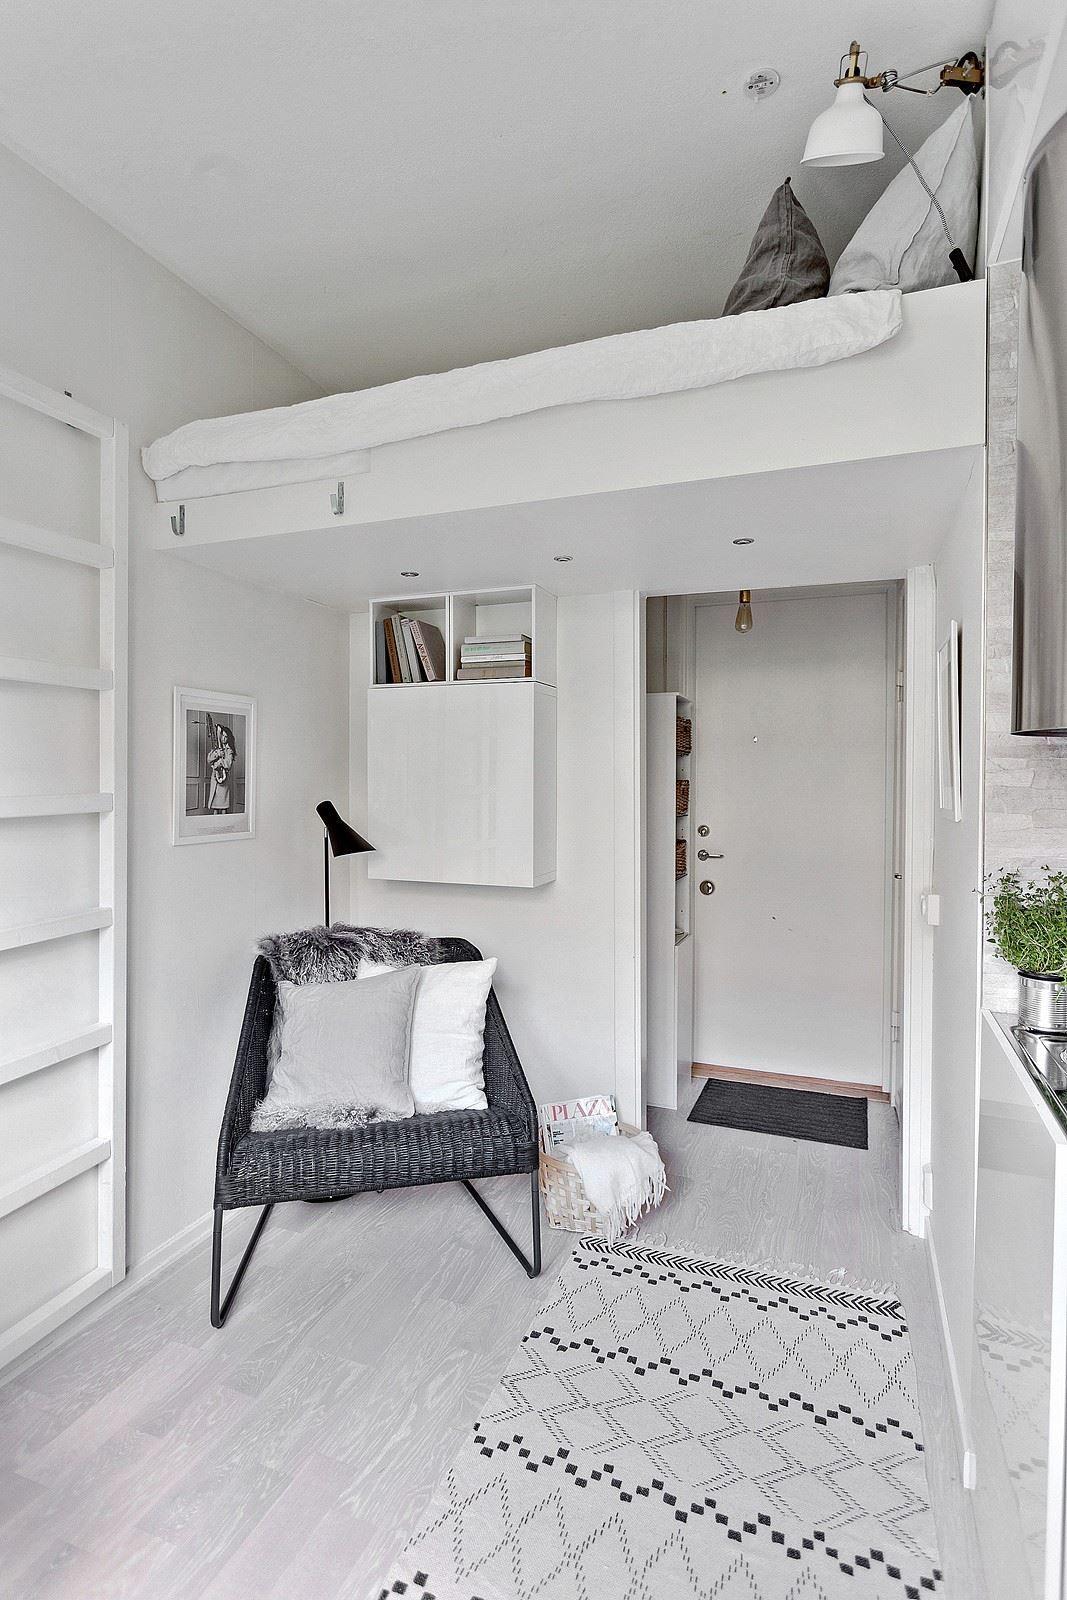 Квартира 13 кв.м. nicety Small apartment interior